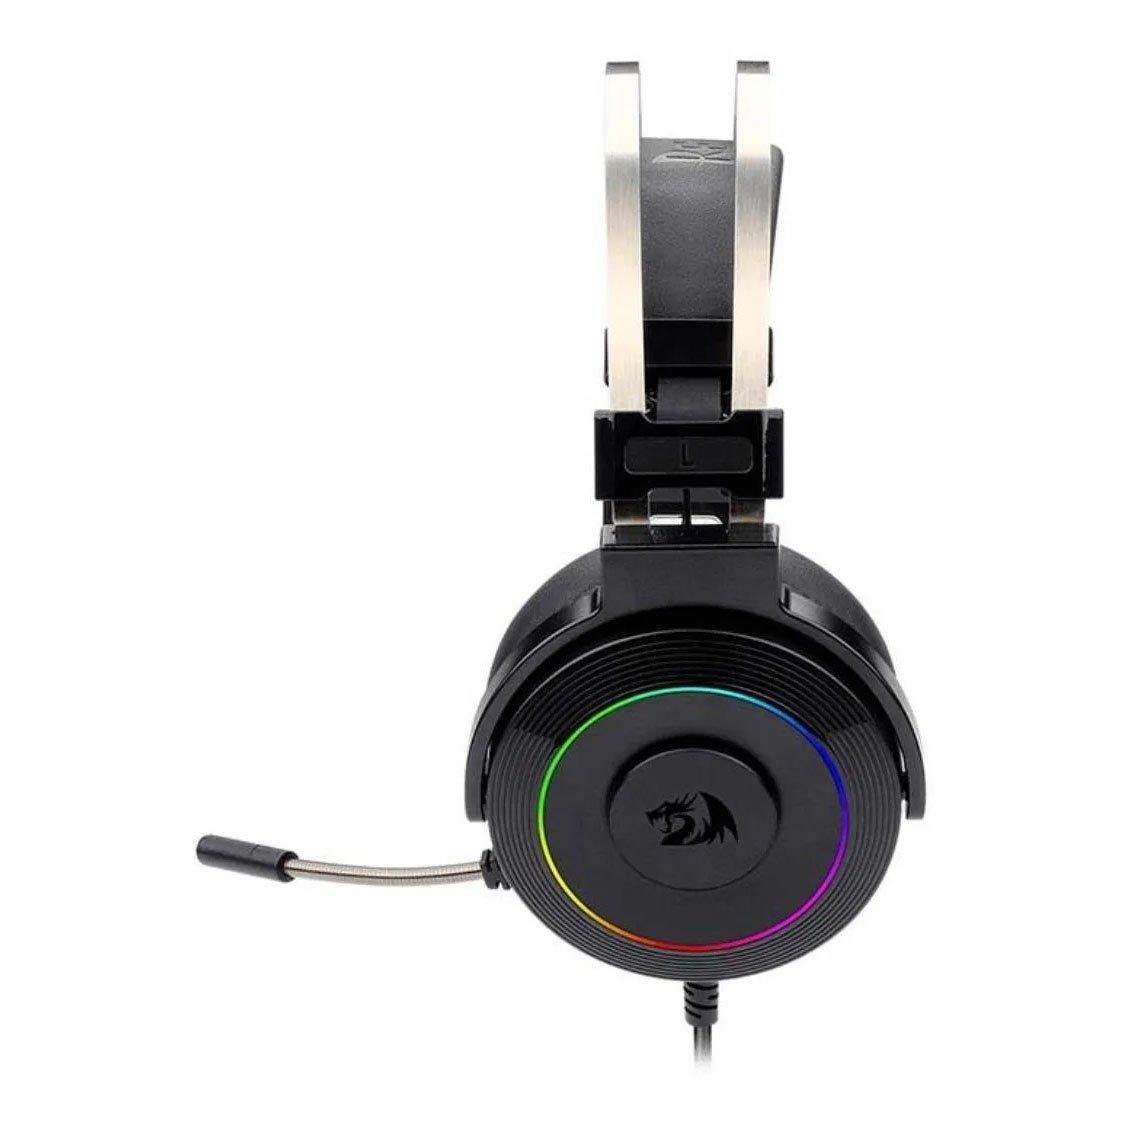 fone de ouvido com microfone gamer redragon usb lamia2 h320 rgb gaming preto 50979 2000 202964 3